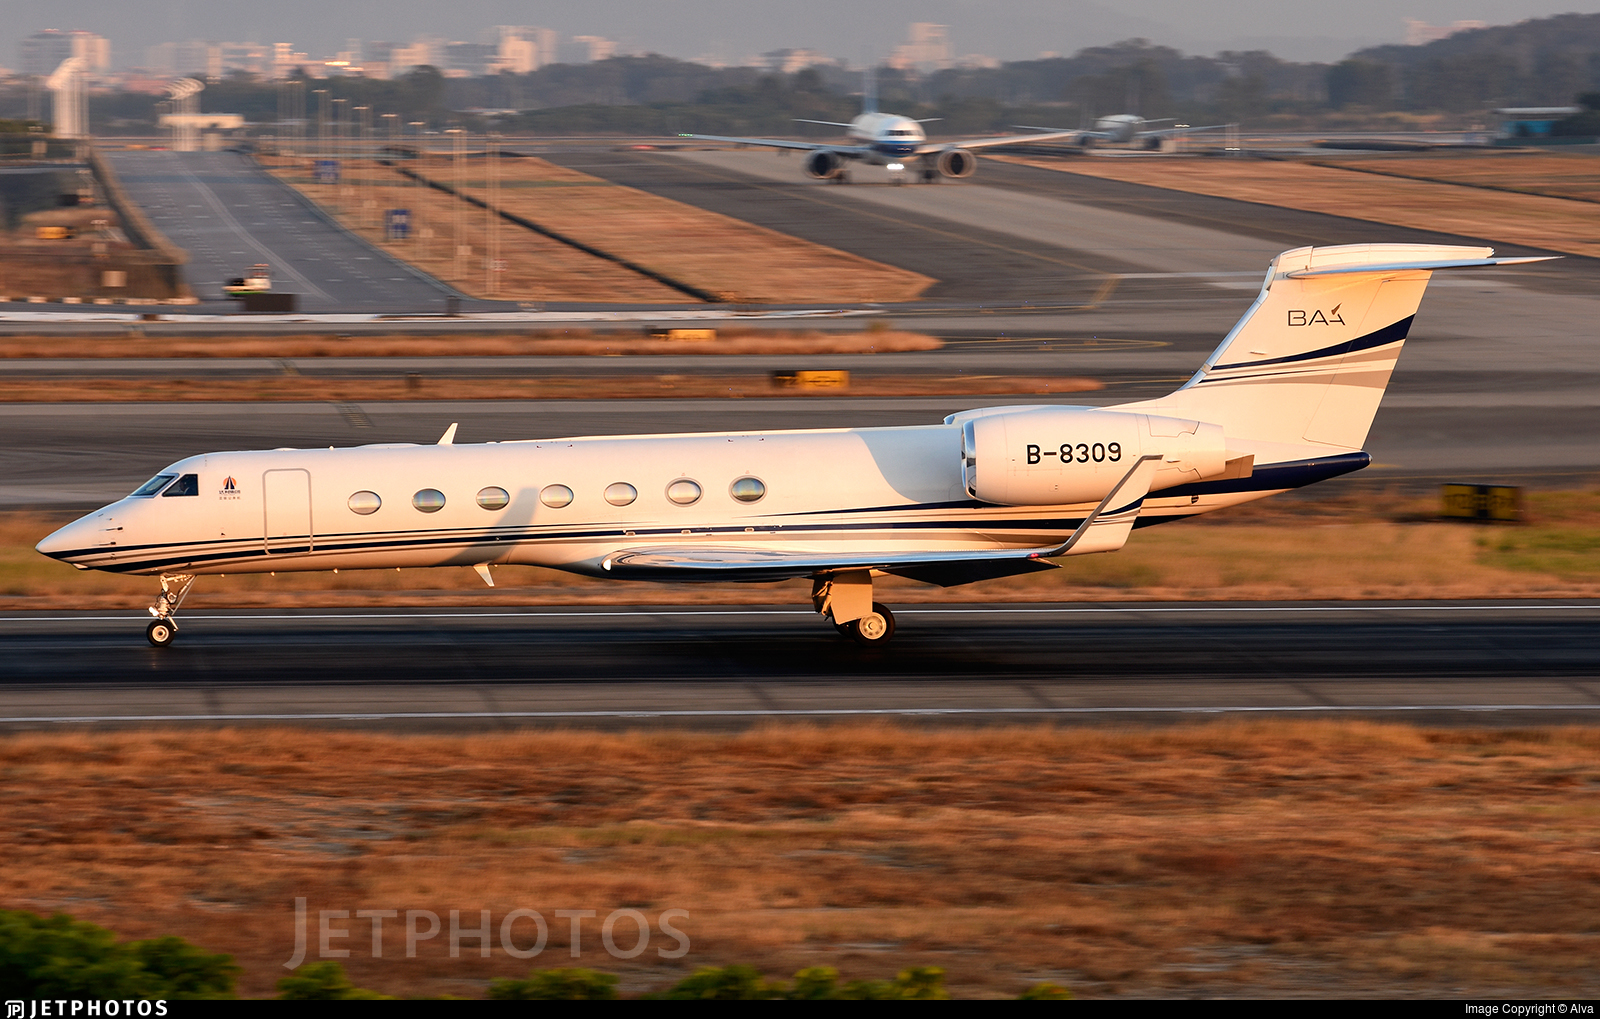 B-8309 - Gulfstream G550 - Business Aviation Asia